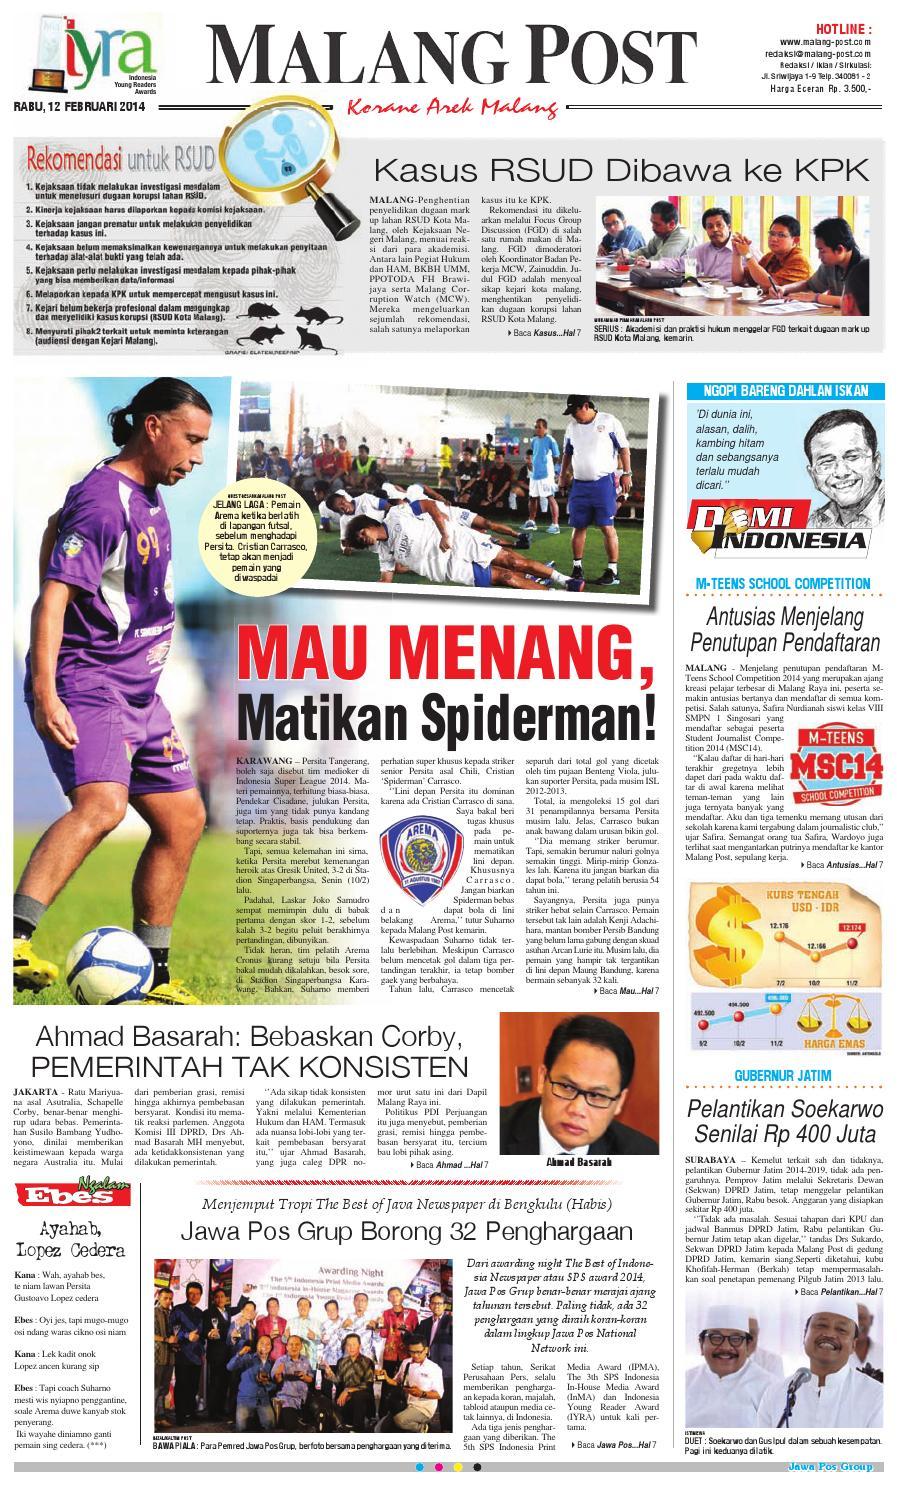 Mp1202 By Mpost Issuu Tcash Vaganza 34 Kripiss Medan Manis